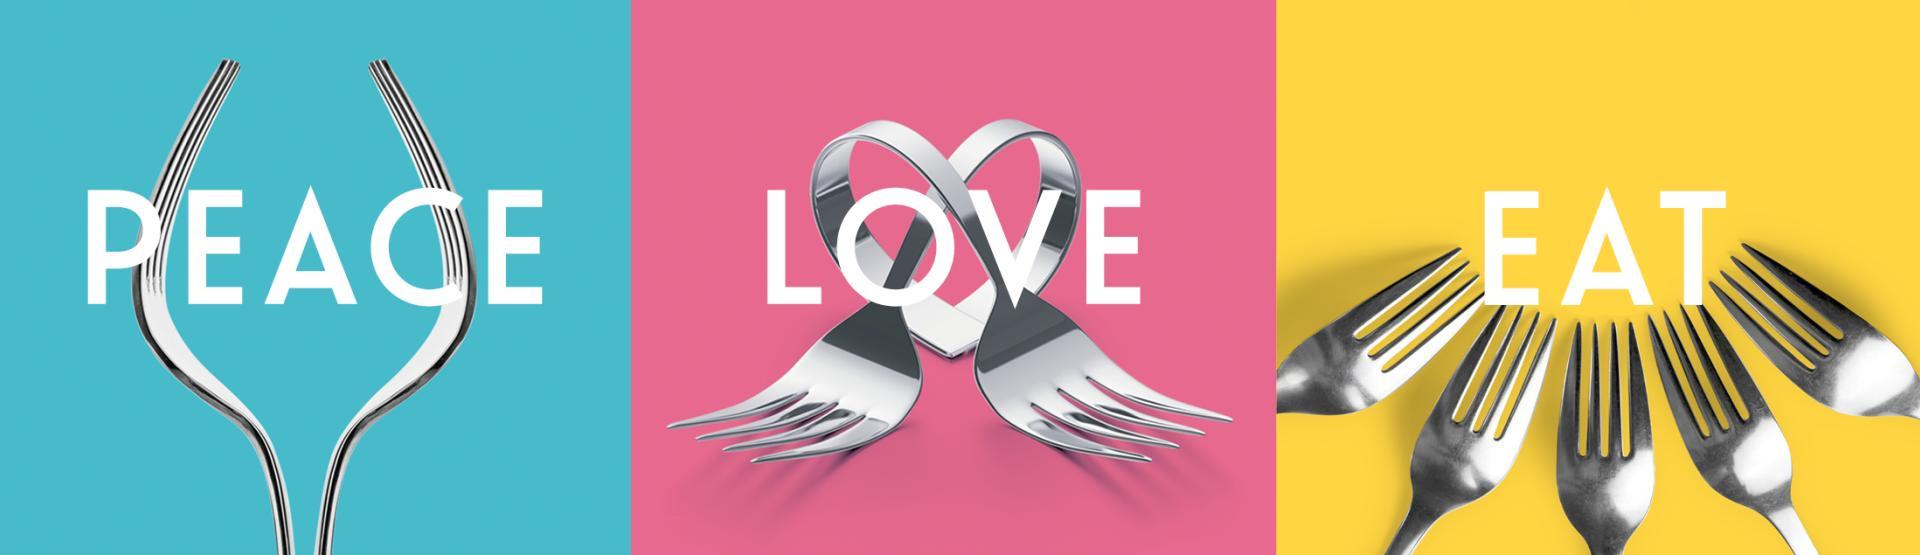 dineGPS Peace Love Eat